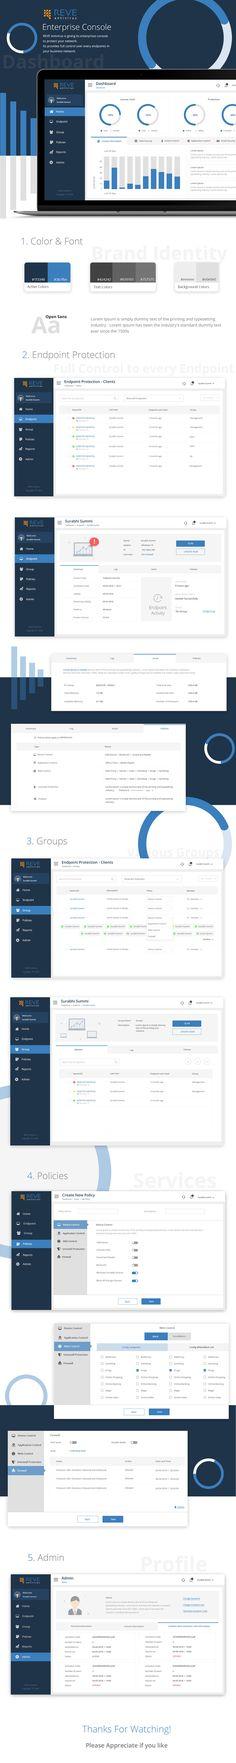 "Check out my @Behance project: ""Enterprises Console"" https://www.behance.net/gallery/64509709/Enterprises-Console"